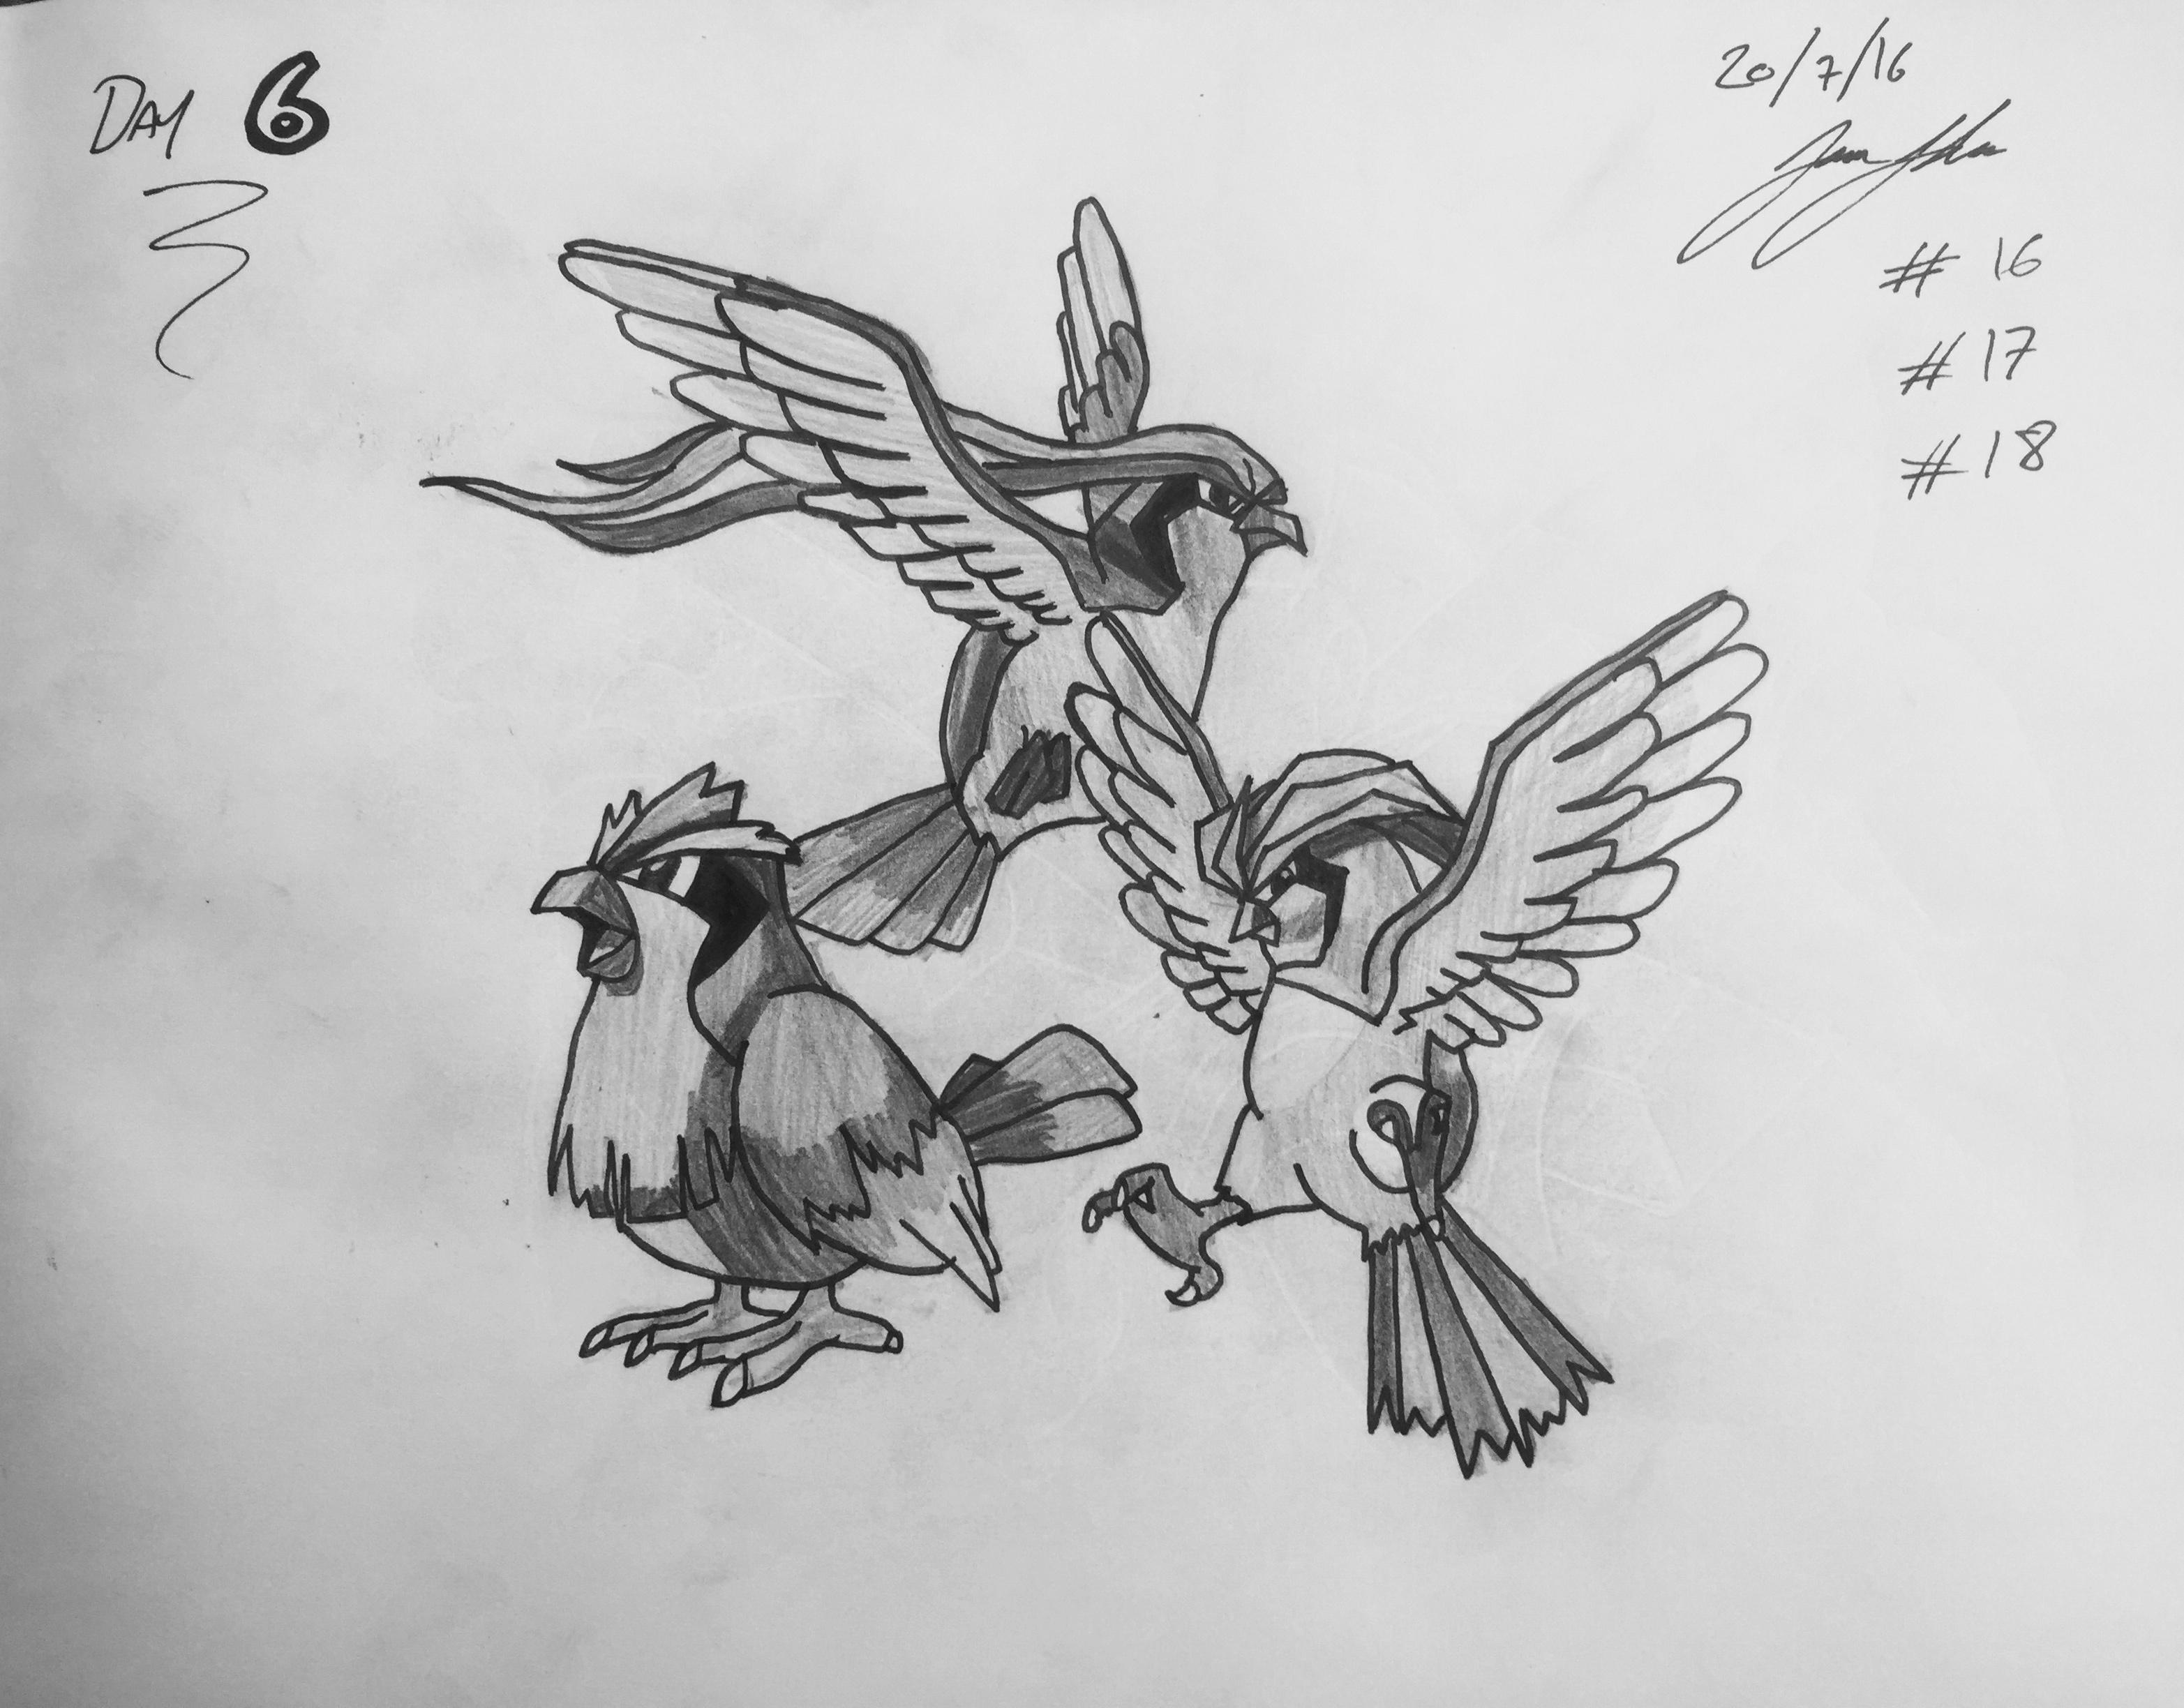 #16 Pidgey #17 Pidgeotto #18 Pidgeot